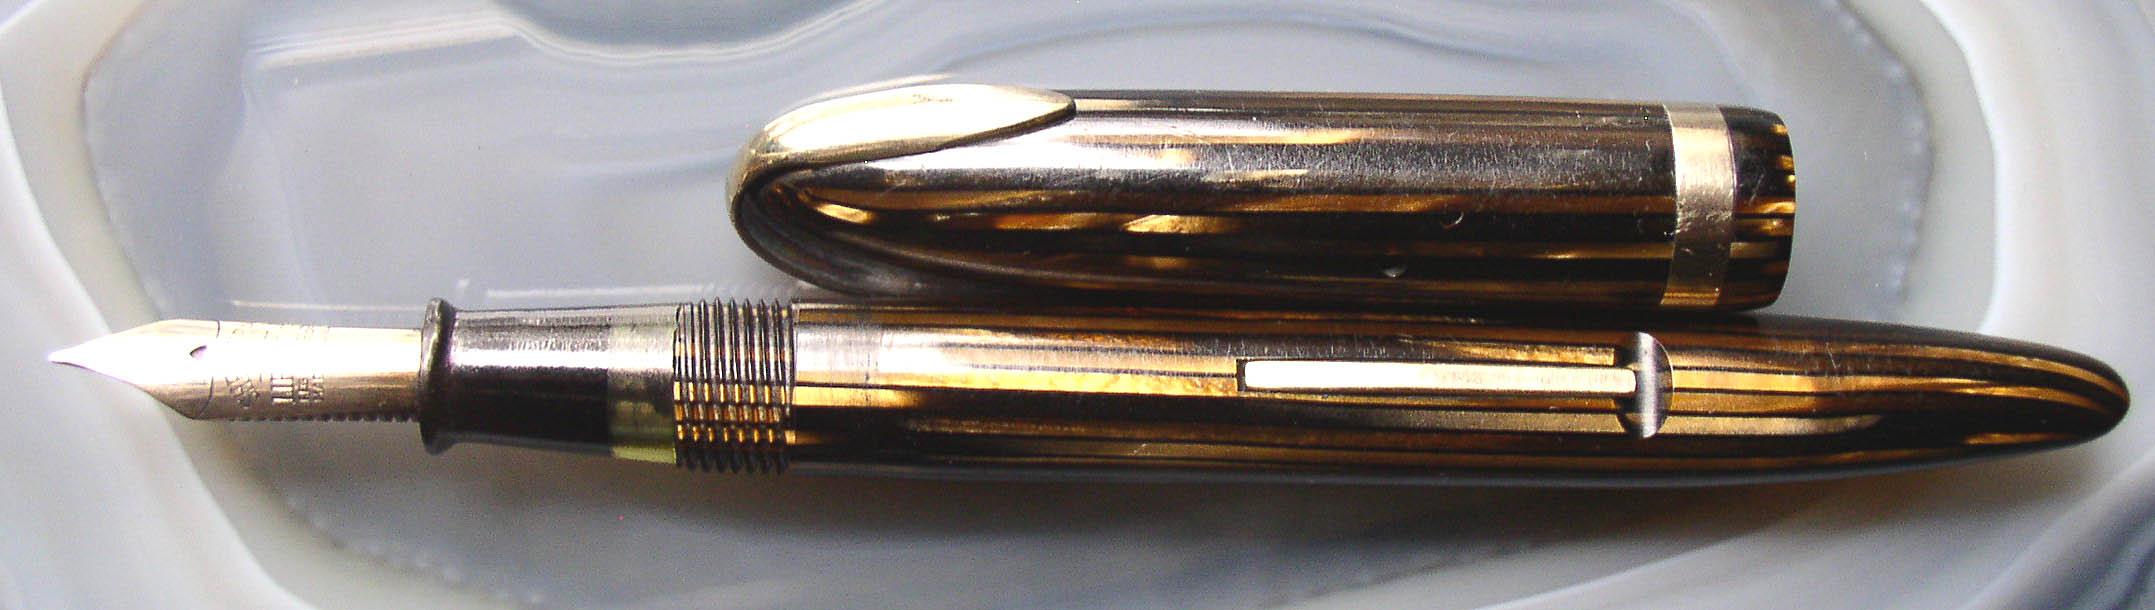 Vintage Sheaffer Lifetime Fountain Pen Circa 1940. Realized ...